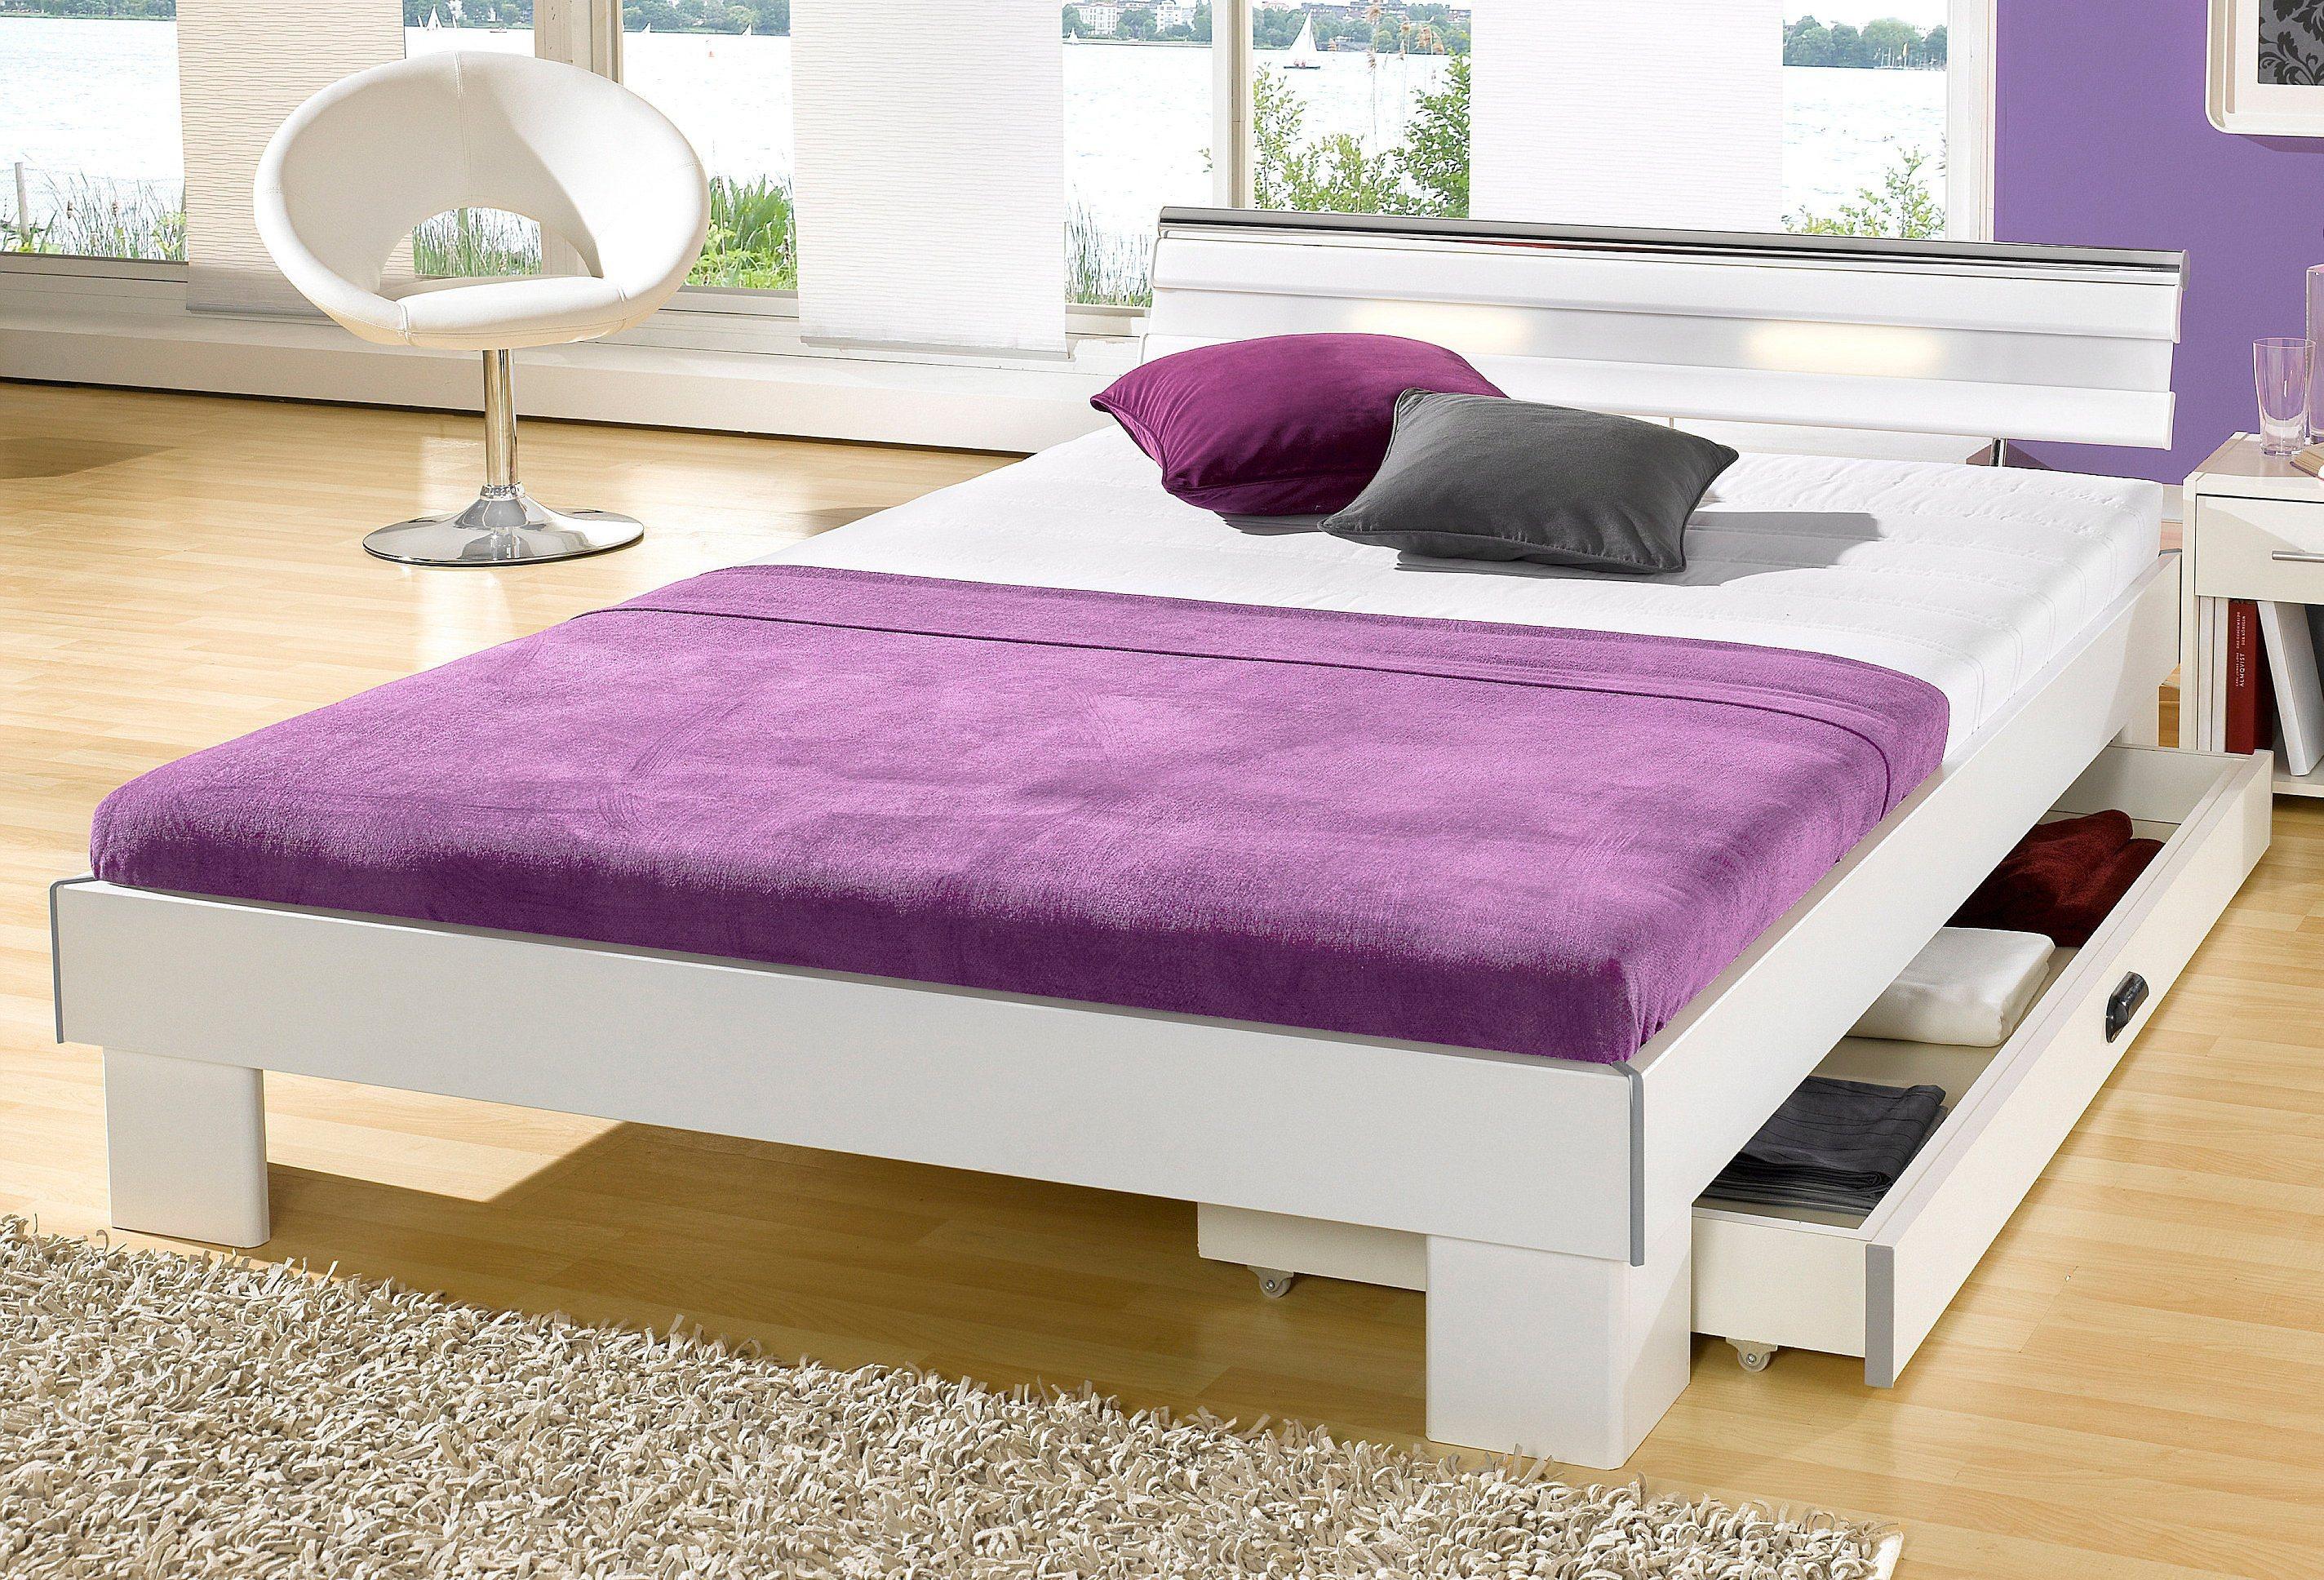 Matraflex Futonbett | Schlafzimmer > Betten > Futonbetten | Weiß - Hell | Polyester | Matraflex